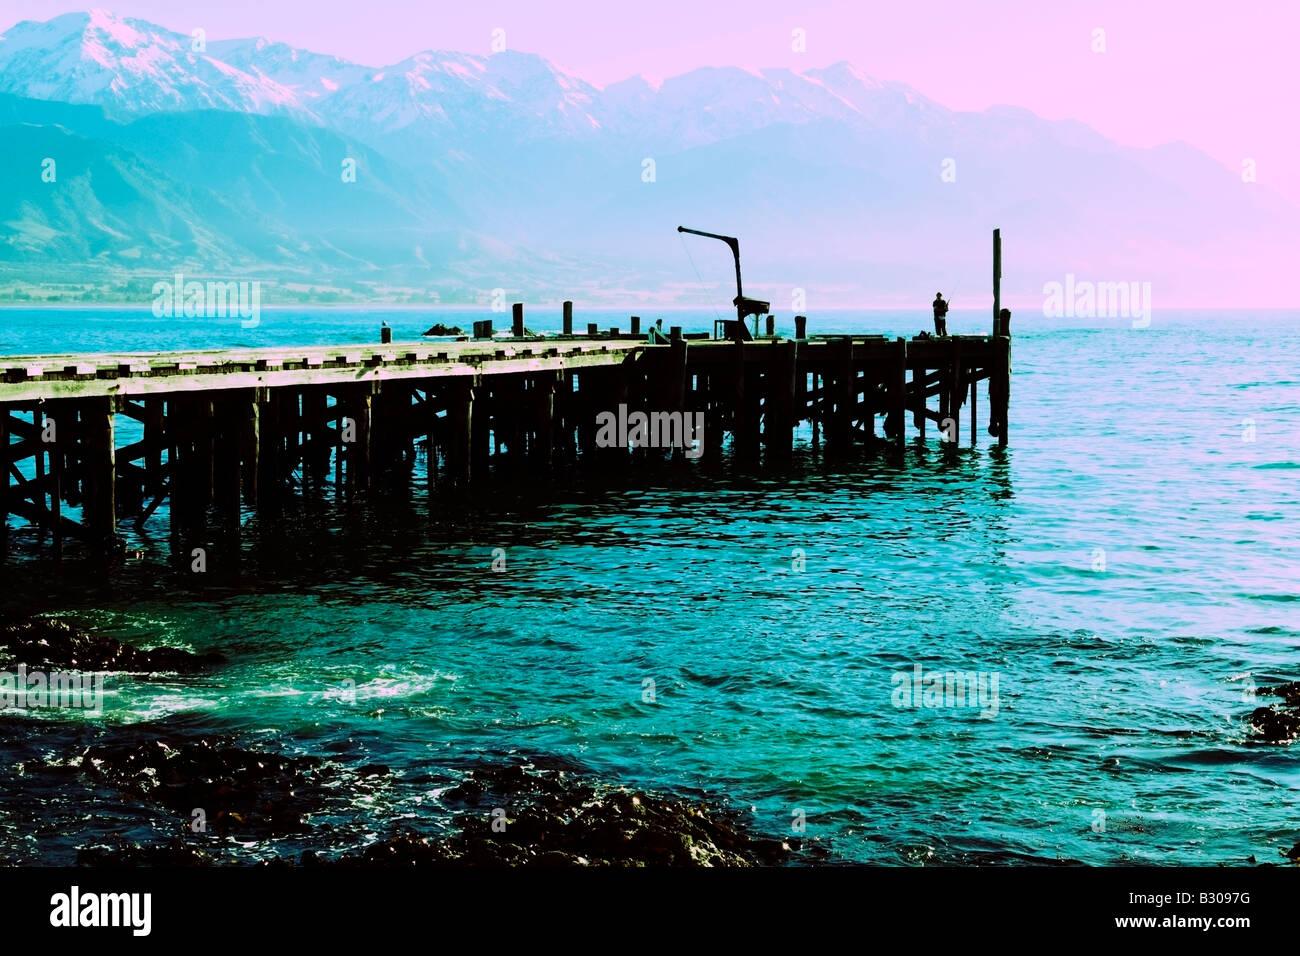 Solitary fisherman, Kaikoura jetty, South Island, New Zealand - Stock Image